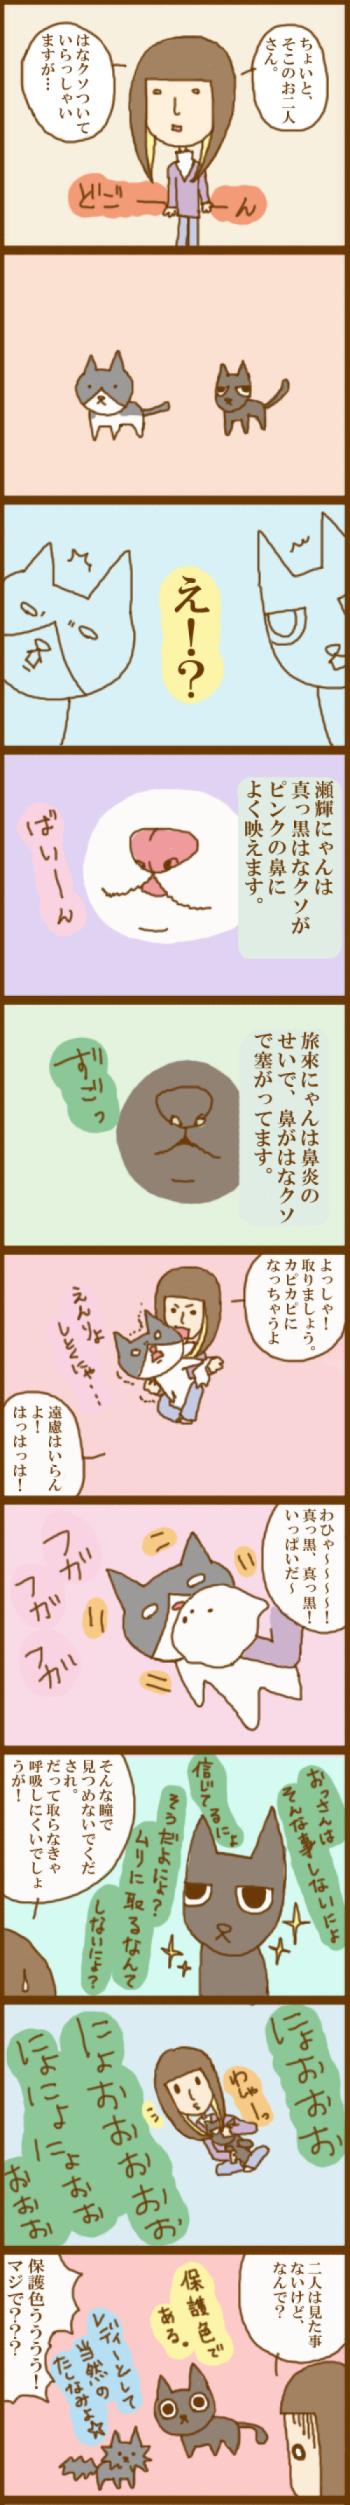 f:id:suzuokayu:20201115190346j:plain